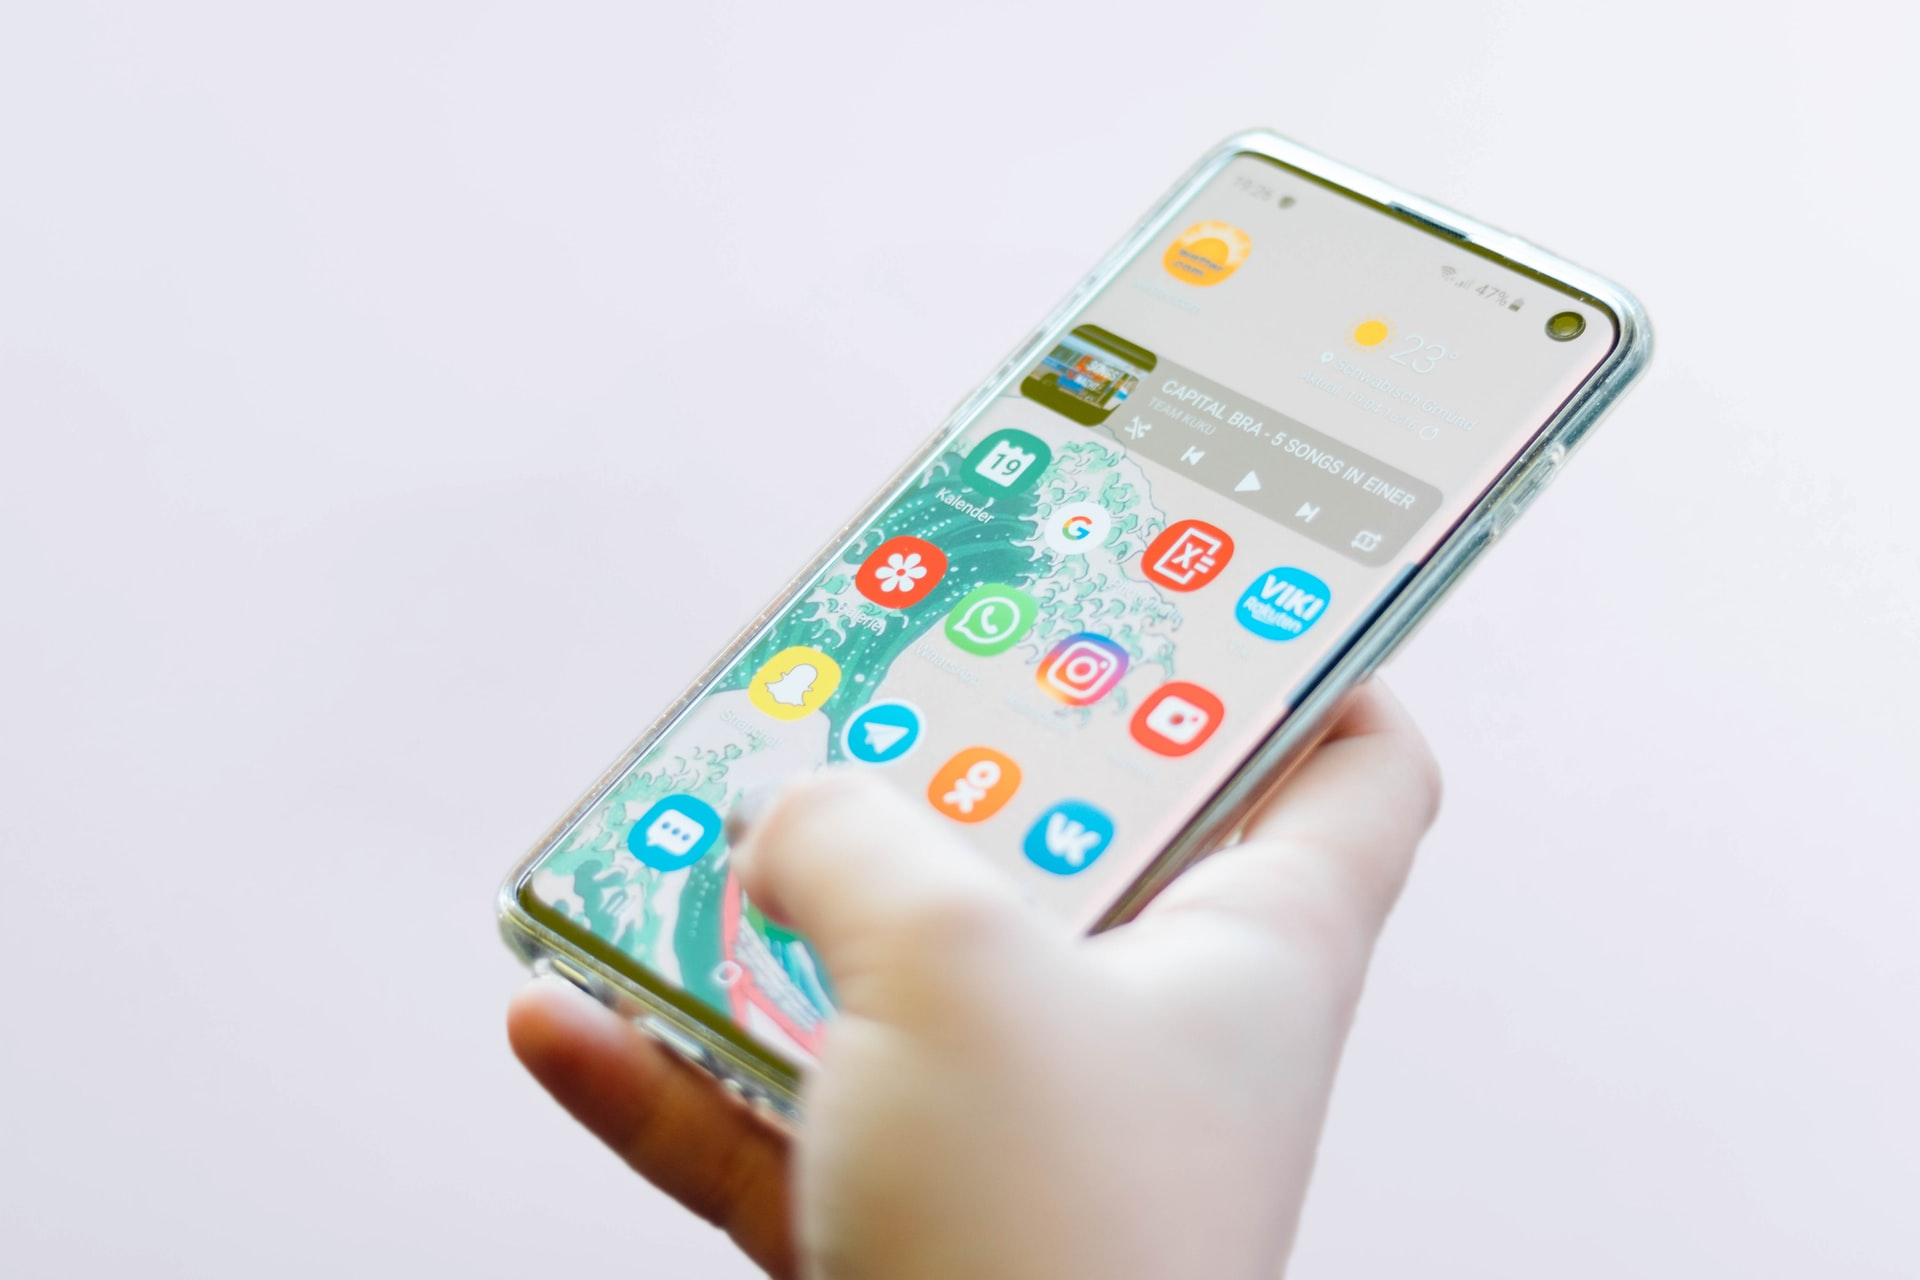 LINEモバイルはワンコインで通話やトークが使い放題!気になる料金や特徴を解説